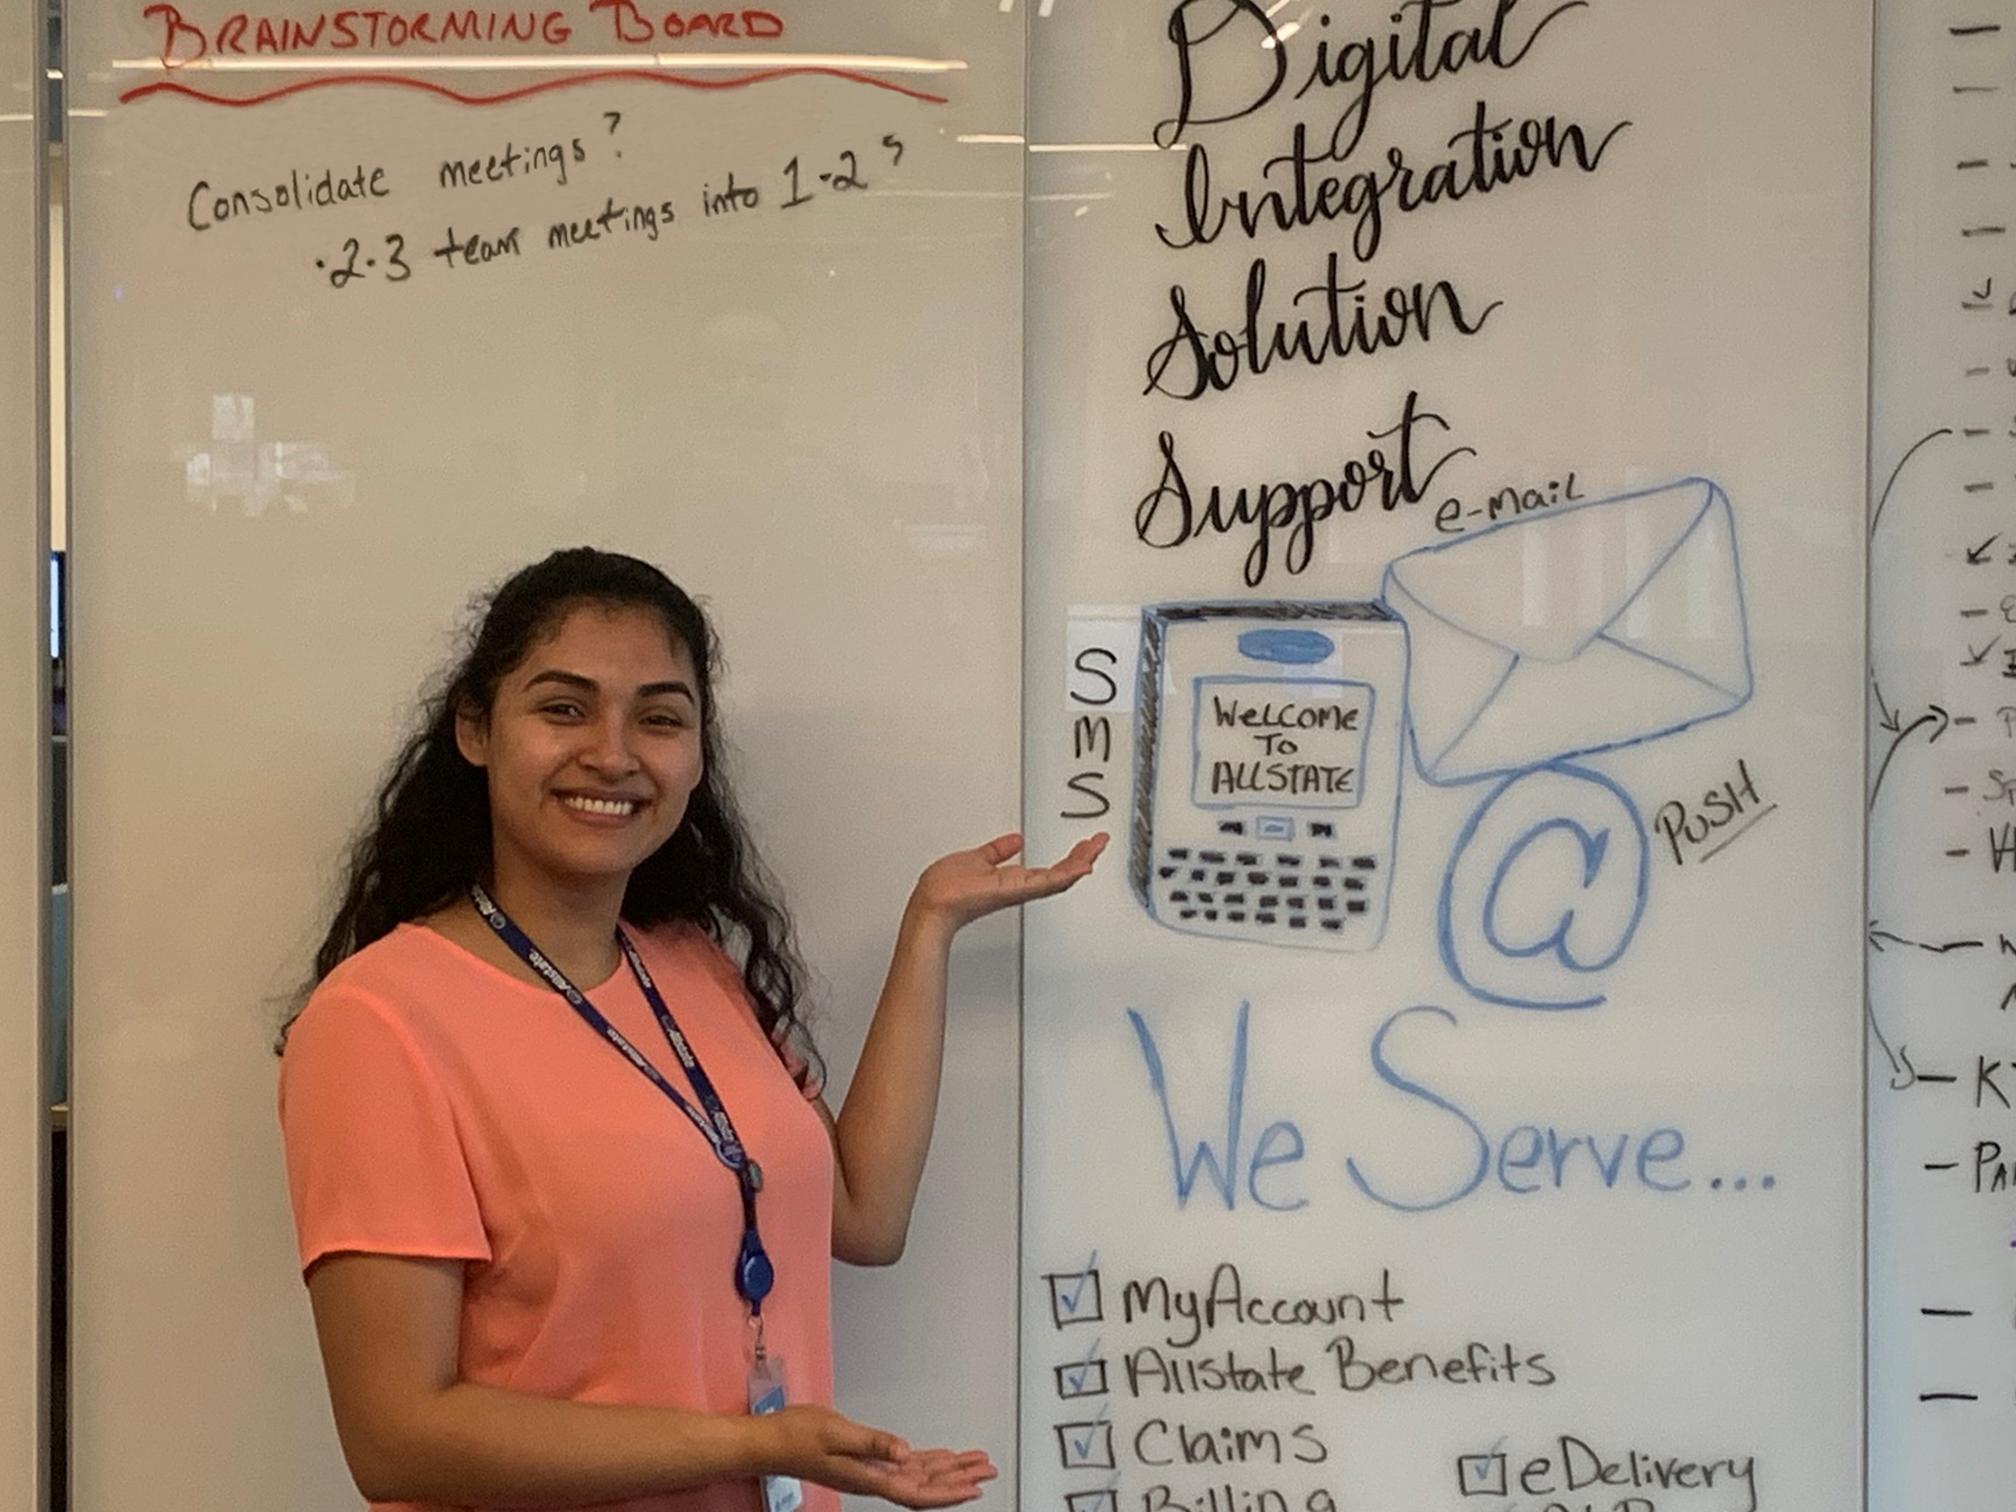 Meet Sintia Customer Service Rep Turned App Developer Allstate Careers